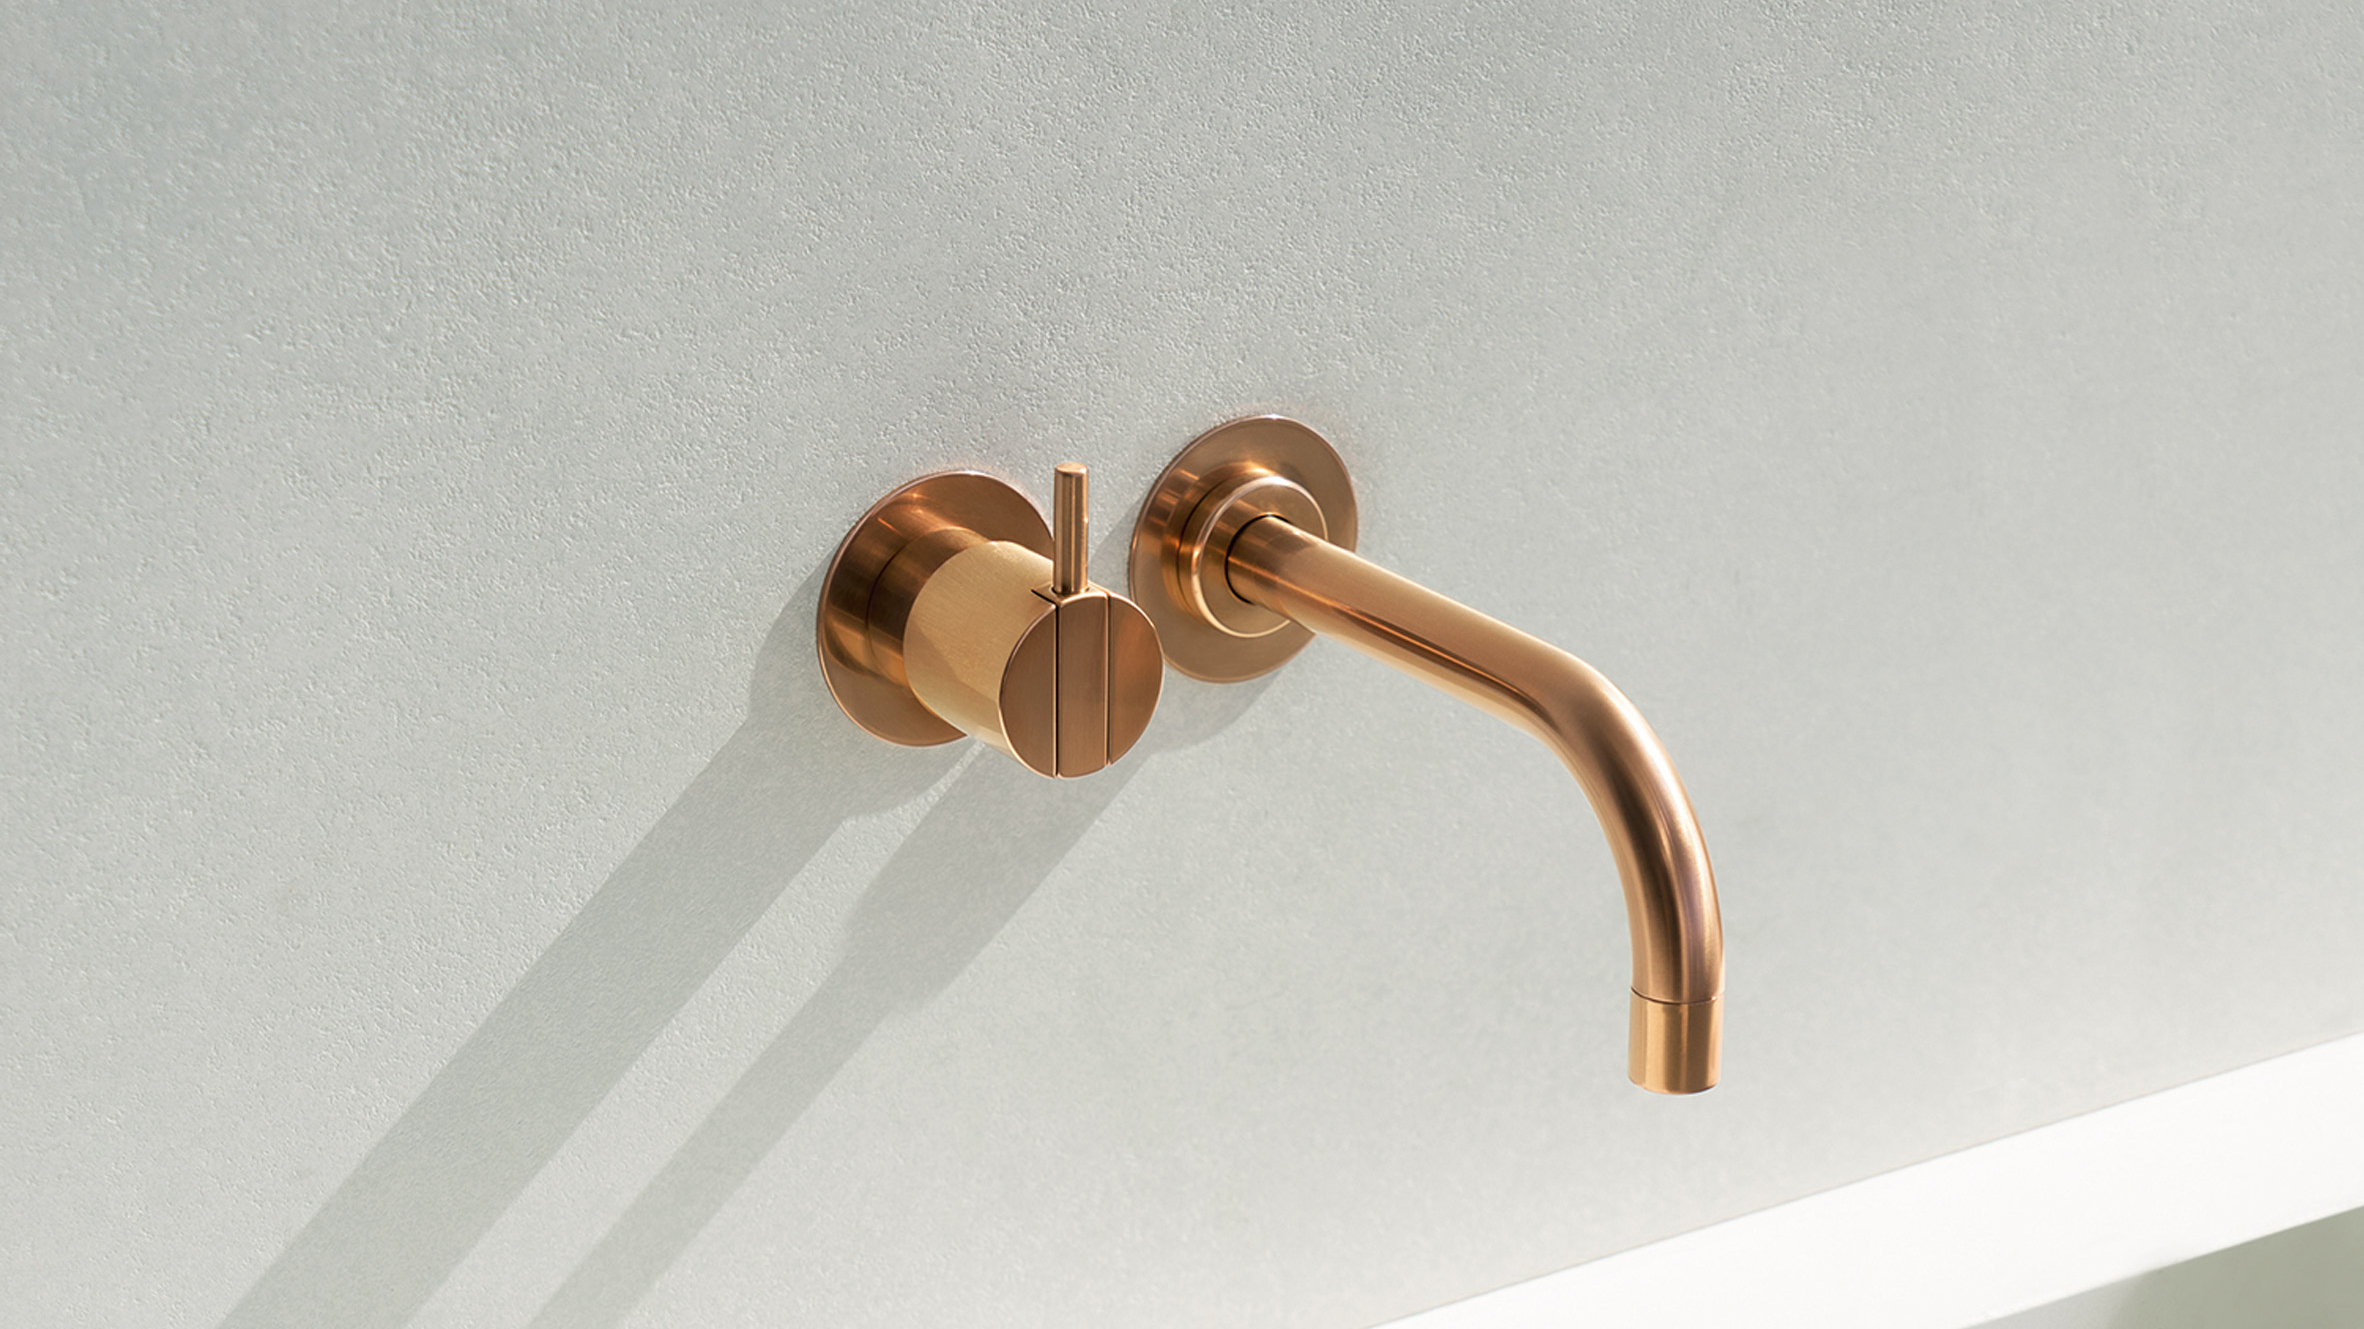 Arne Jacobsen's Vola tap design celebrates 50th birthday